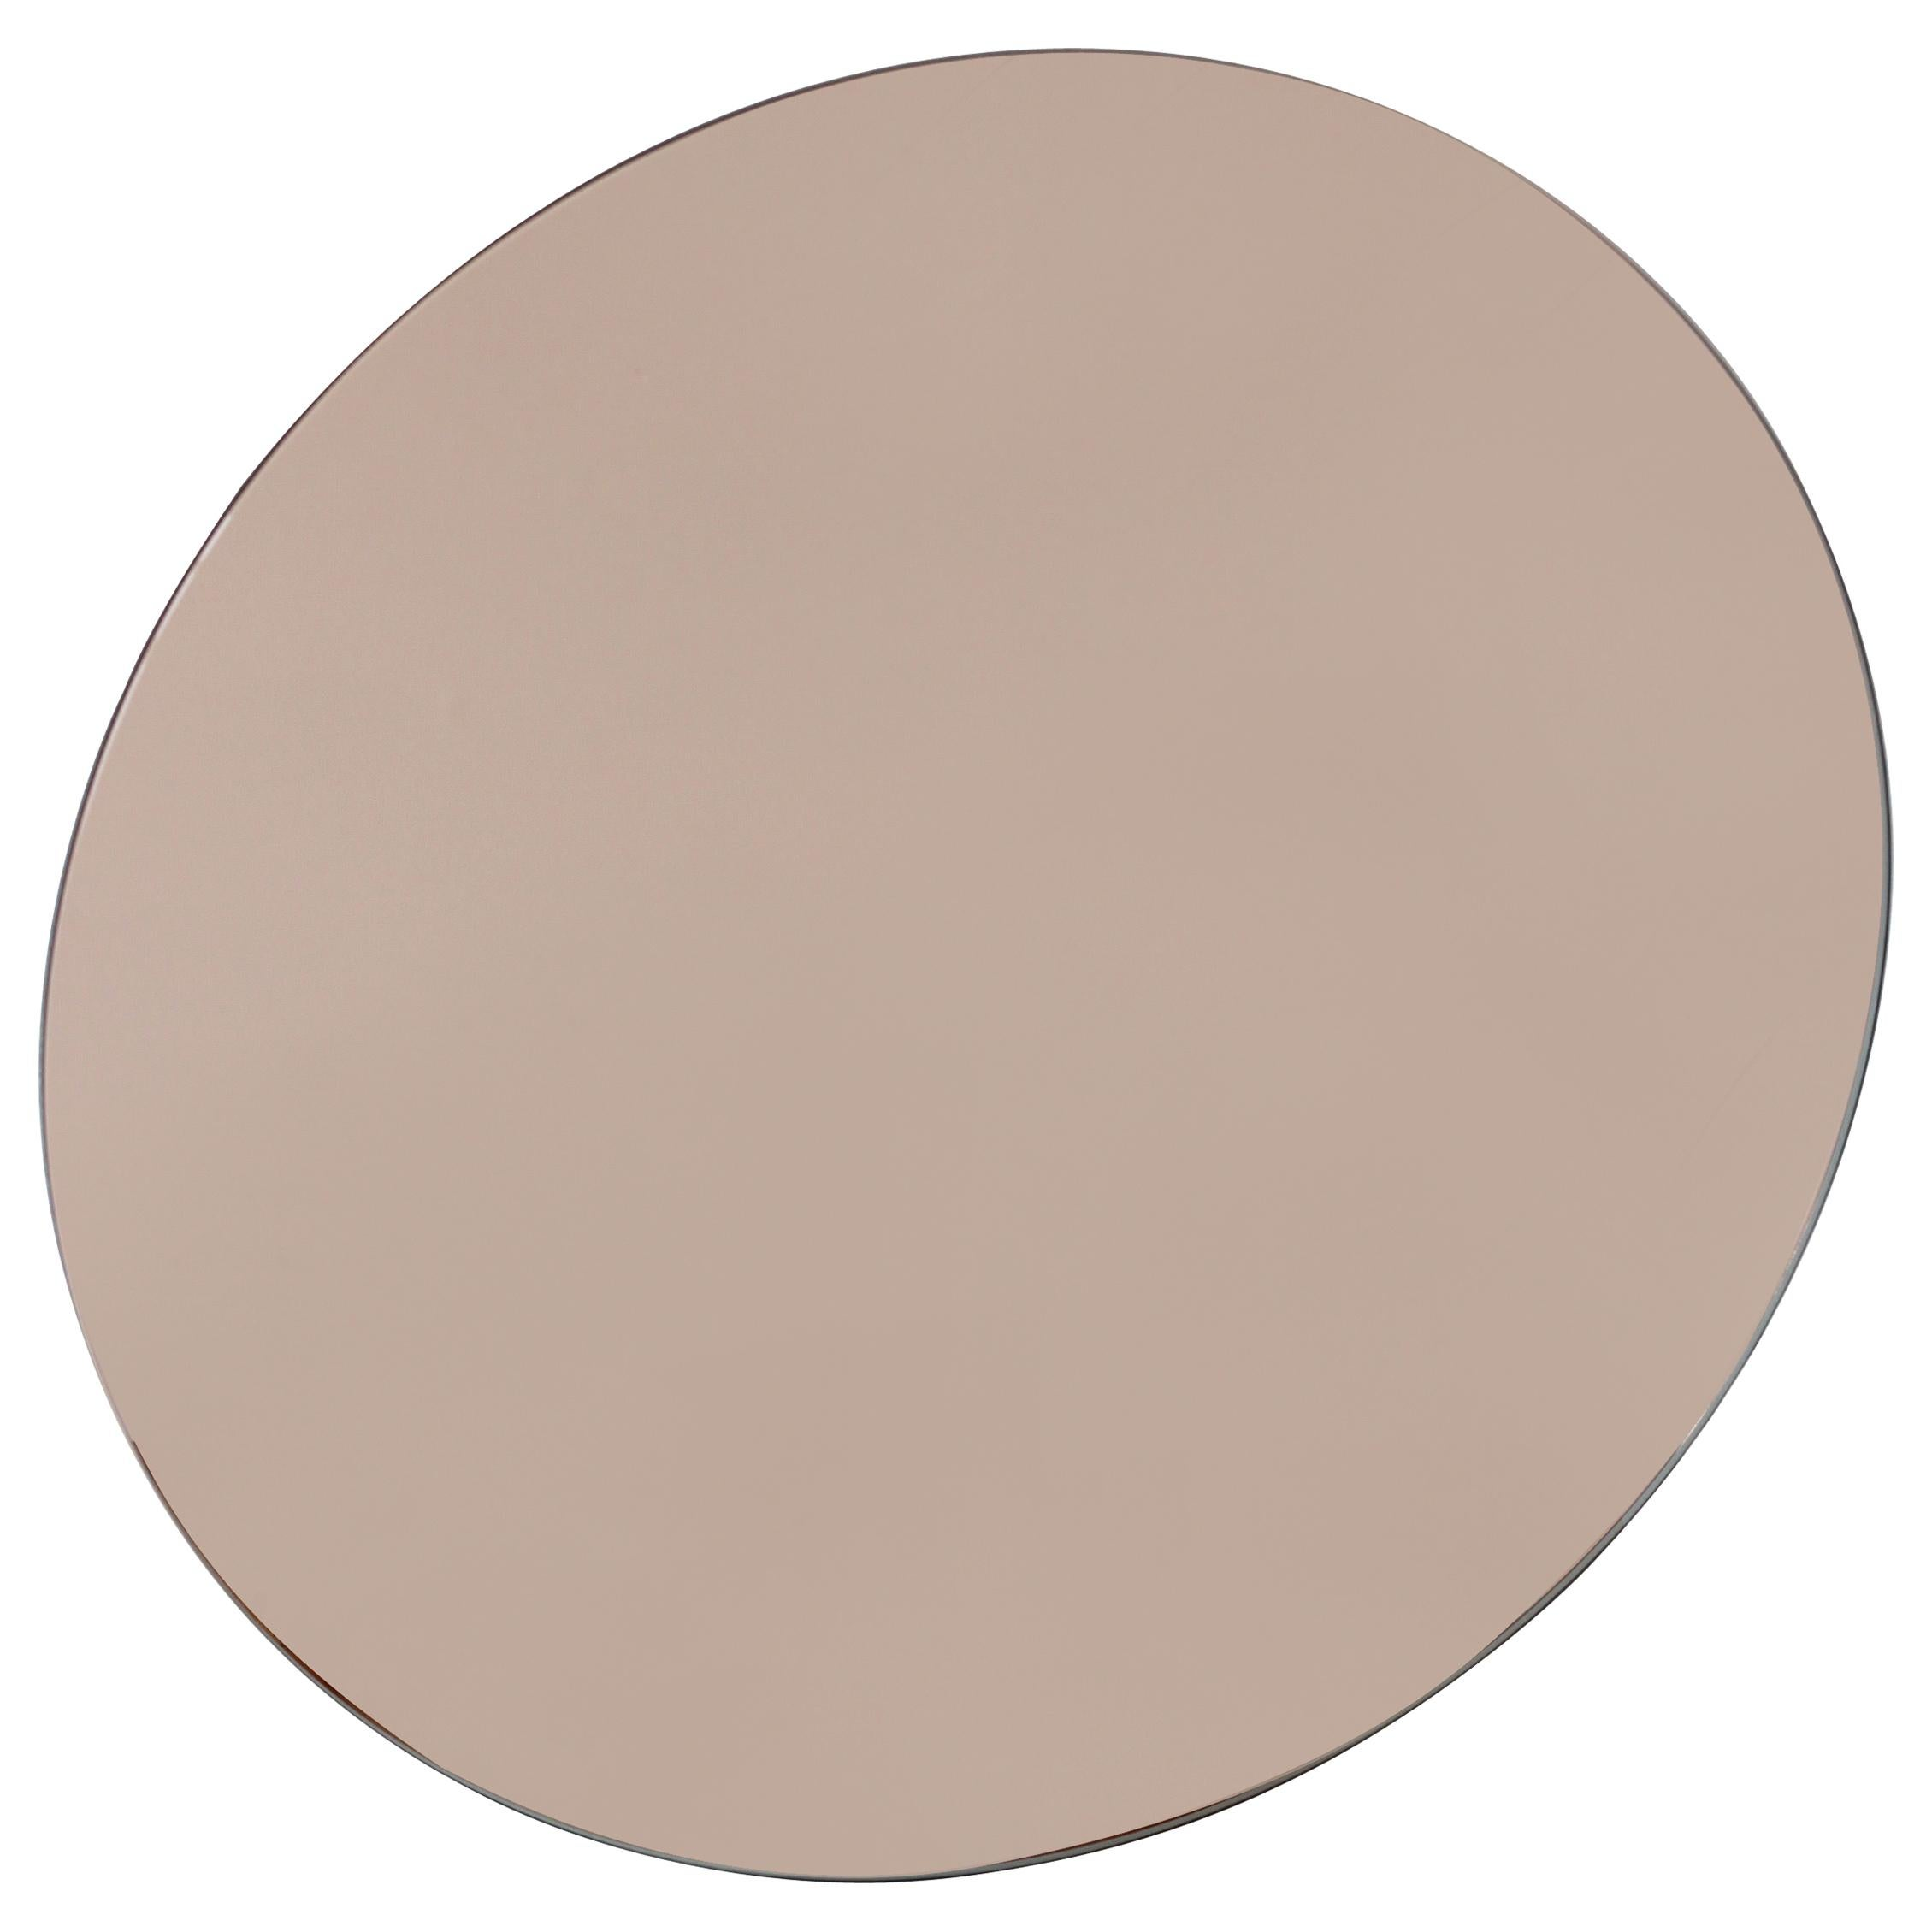 Orbis™ Rose / Peach Tinted Round Contemporary Bespoke Frameless Mirror - Large